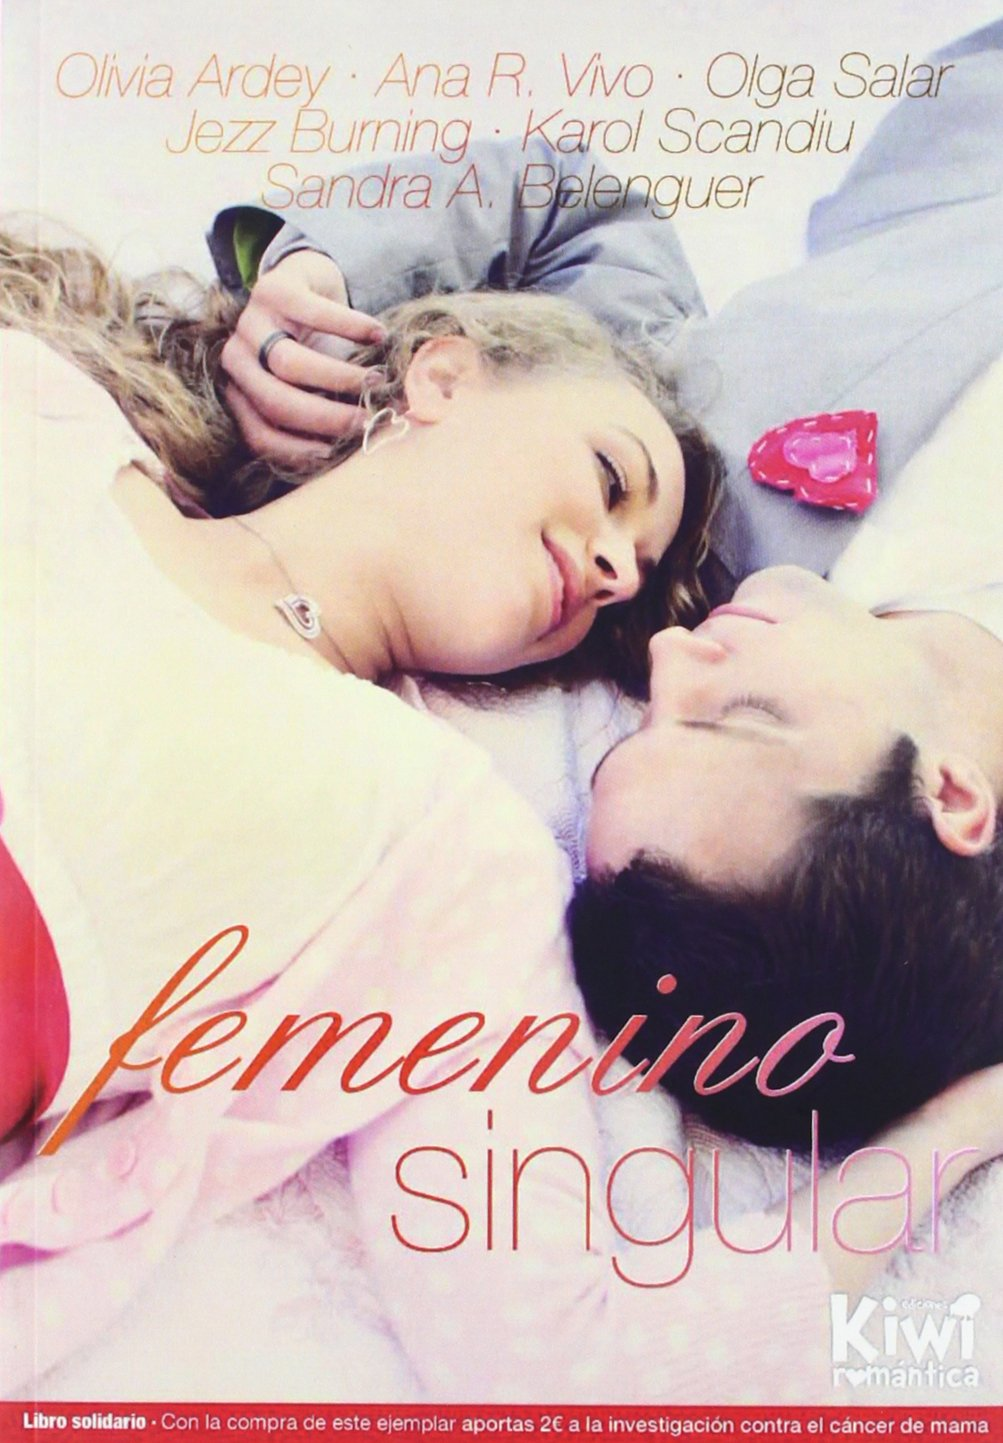 Femenino Singular (Spanish Edition): Varios Autores, Olivia Ardey, Ana R. Vivo, Olga Salar, Jezz Burning, Karol Scandiu, Sandra A. Belenguer: 9788493940379: ...